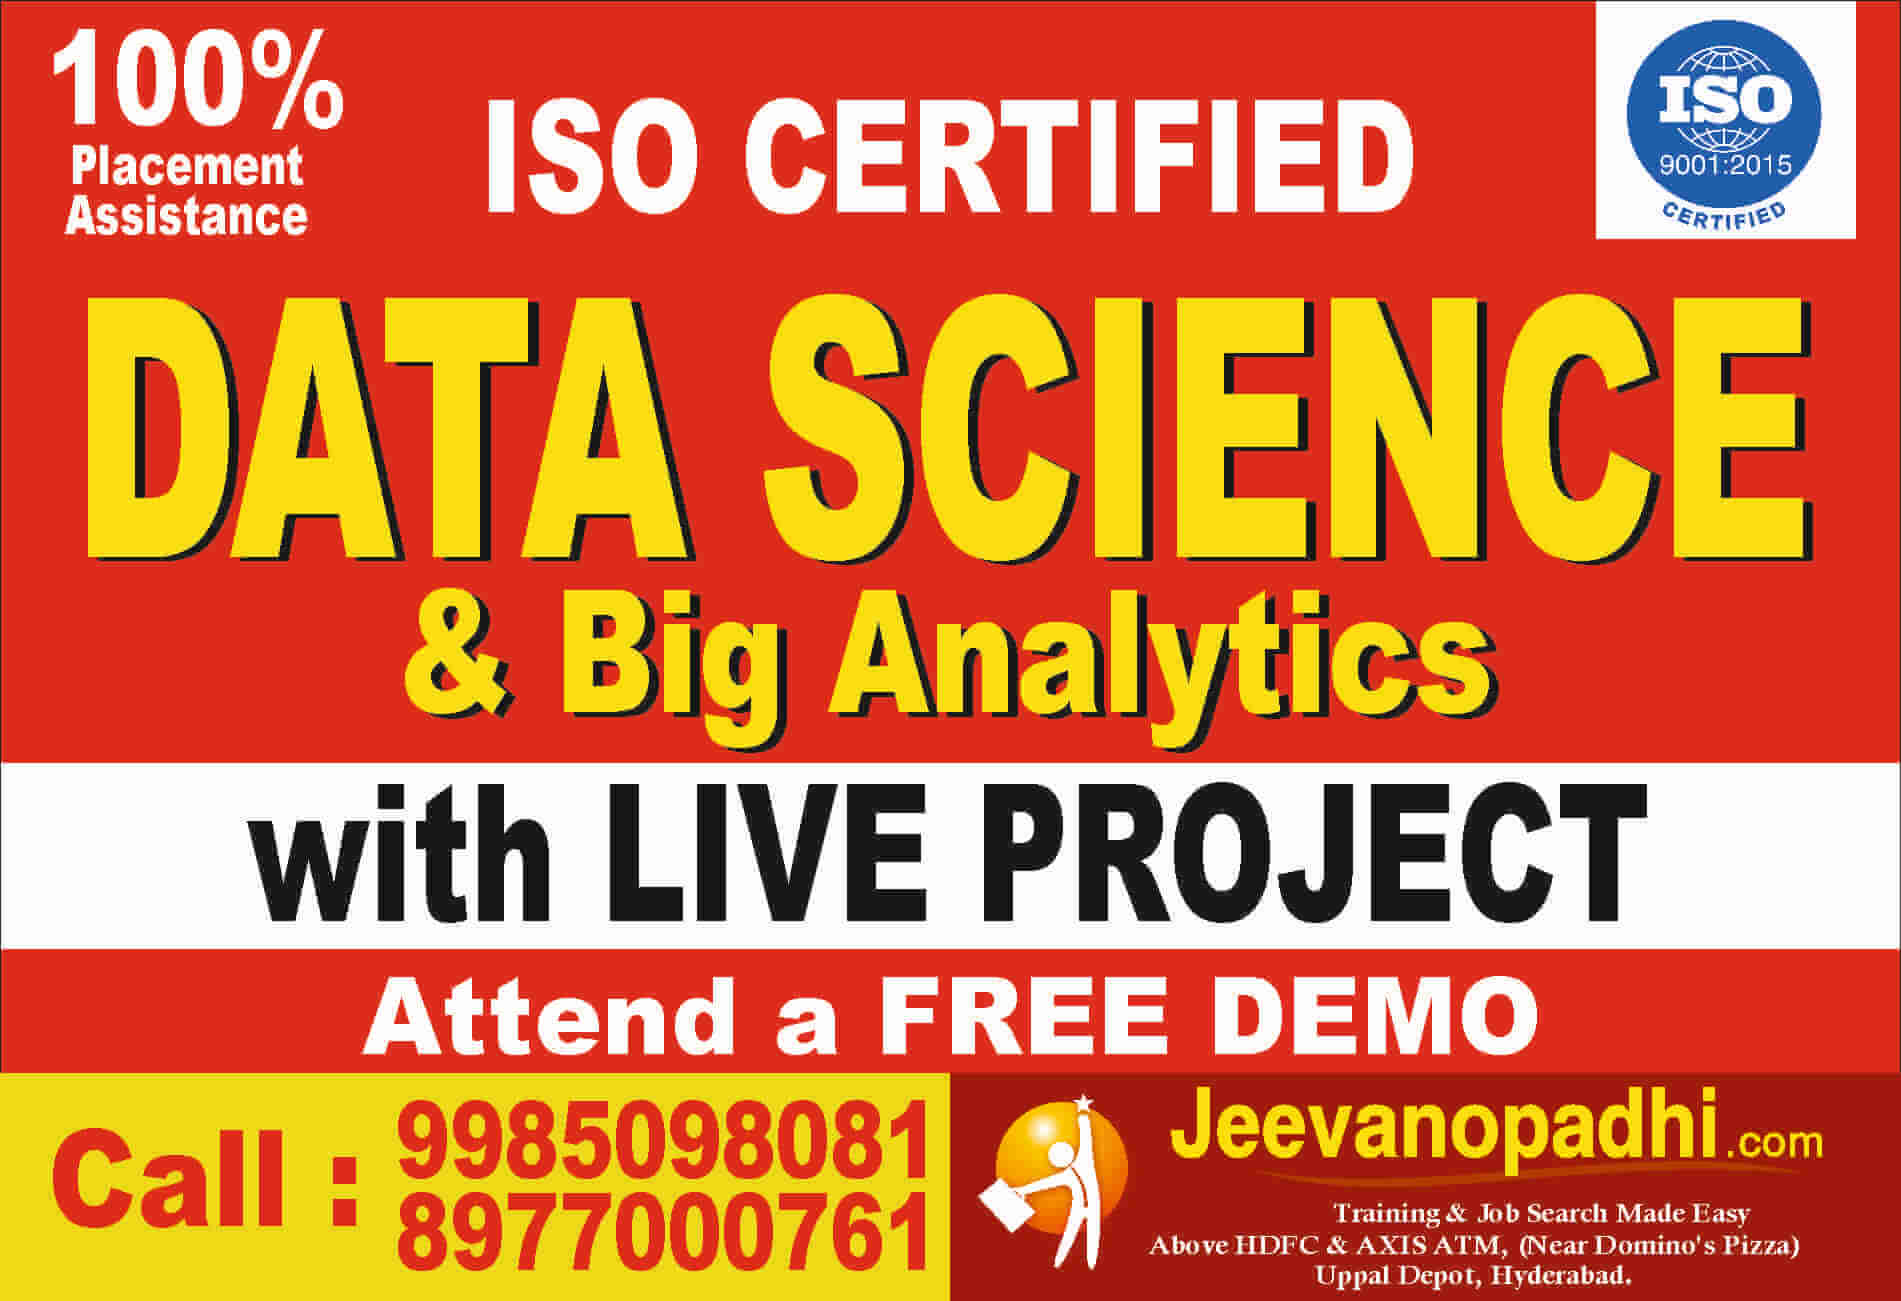 Hadoop And Big Data Training In Hyderabad Uppal Depot Jeevanopadhi